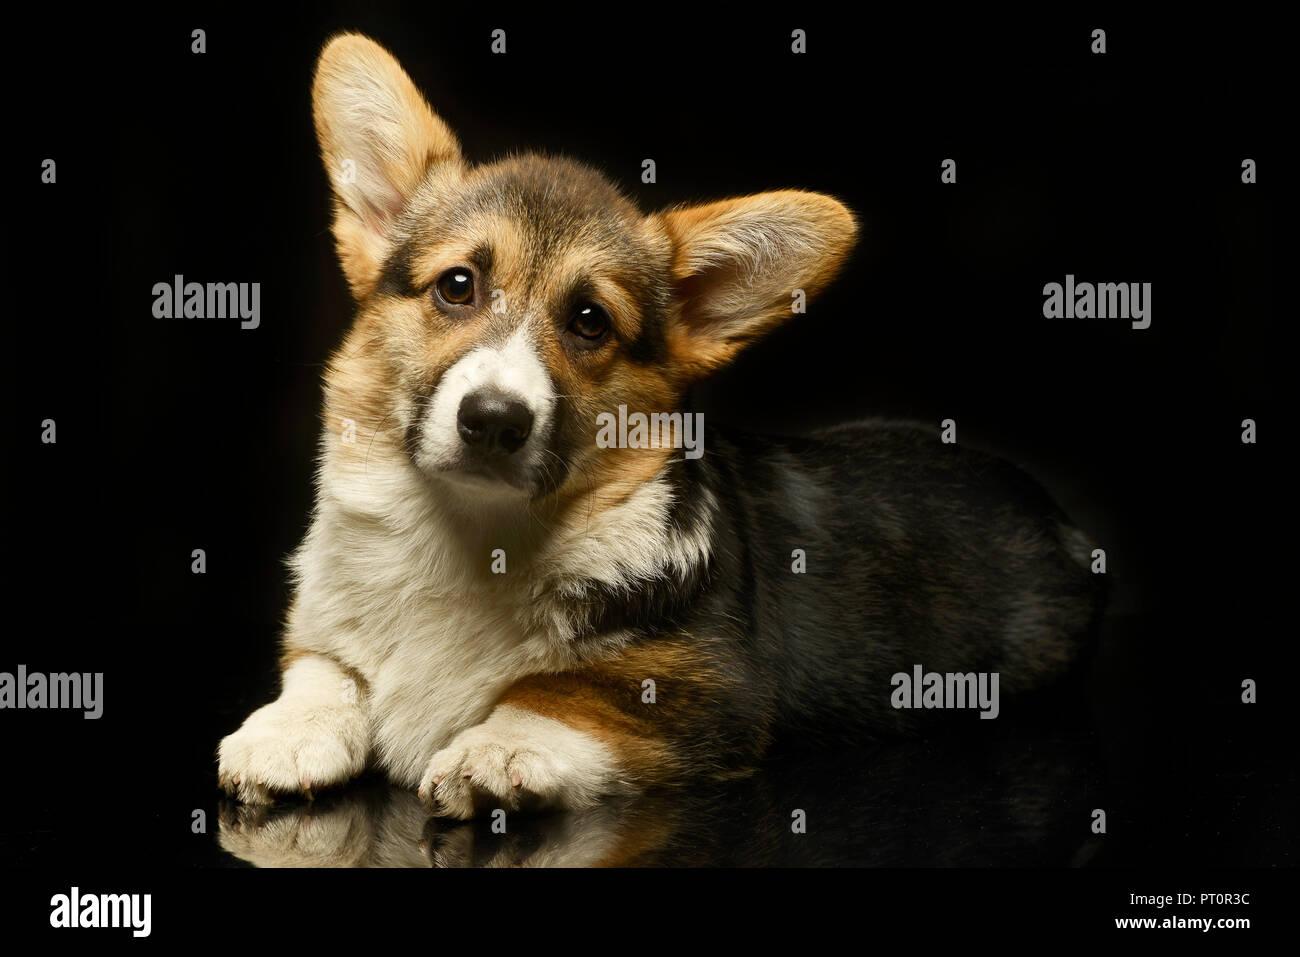 puppy corgie looking in a dark photo studio Stock Photo